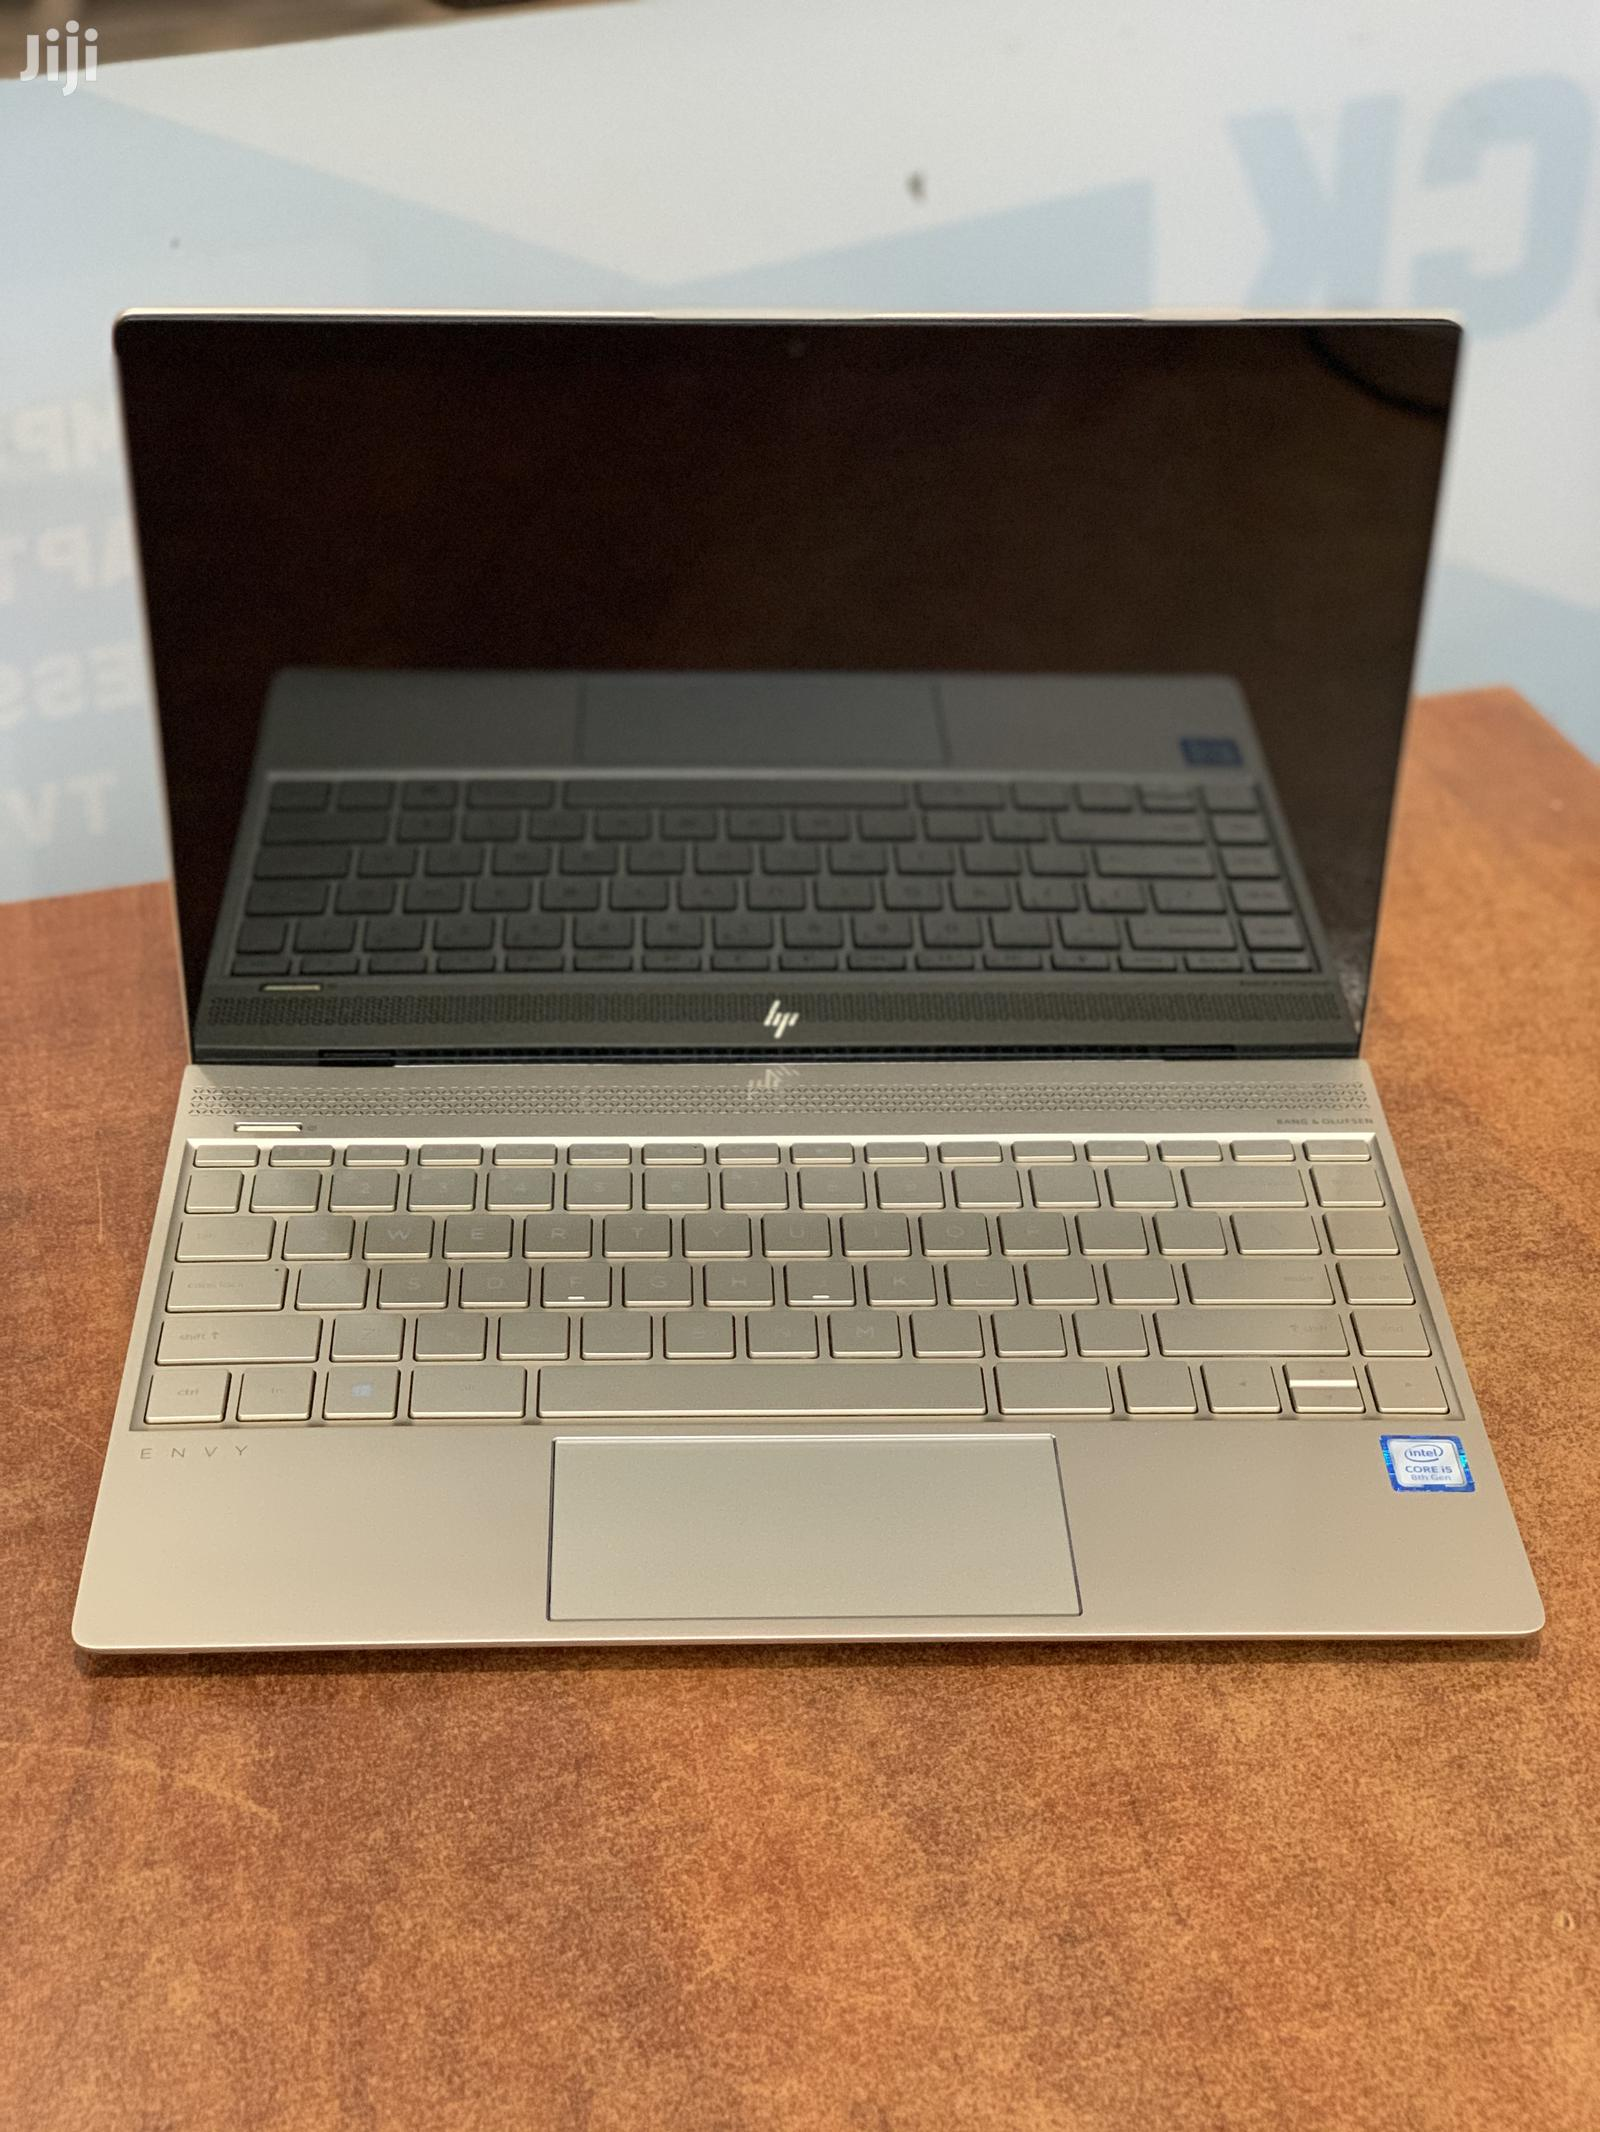 New Laptop HP Envy 13 8GB Intel Core I5 SSHD (Hybrid) 256GB